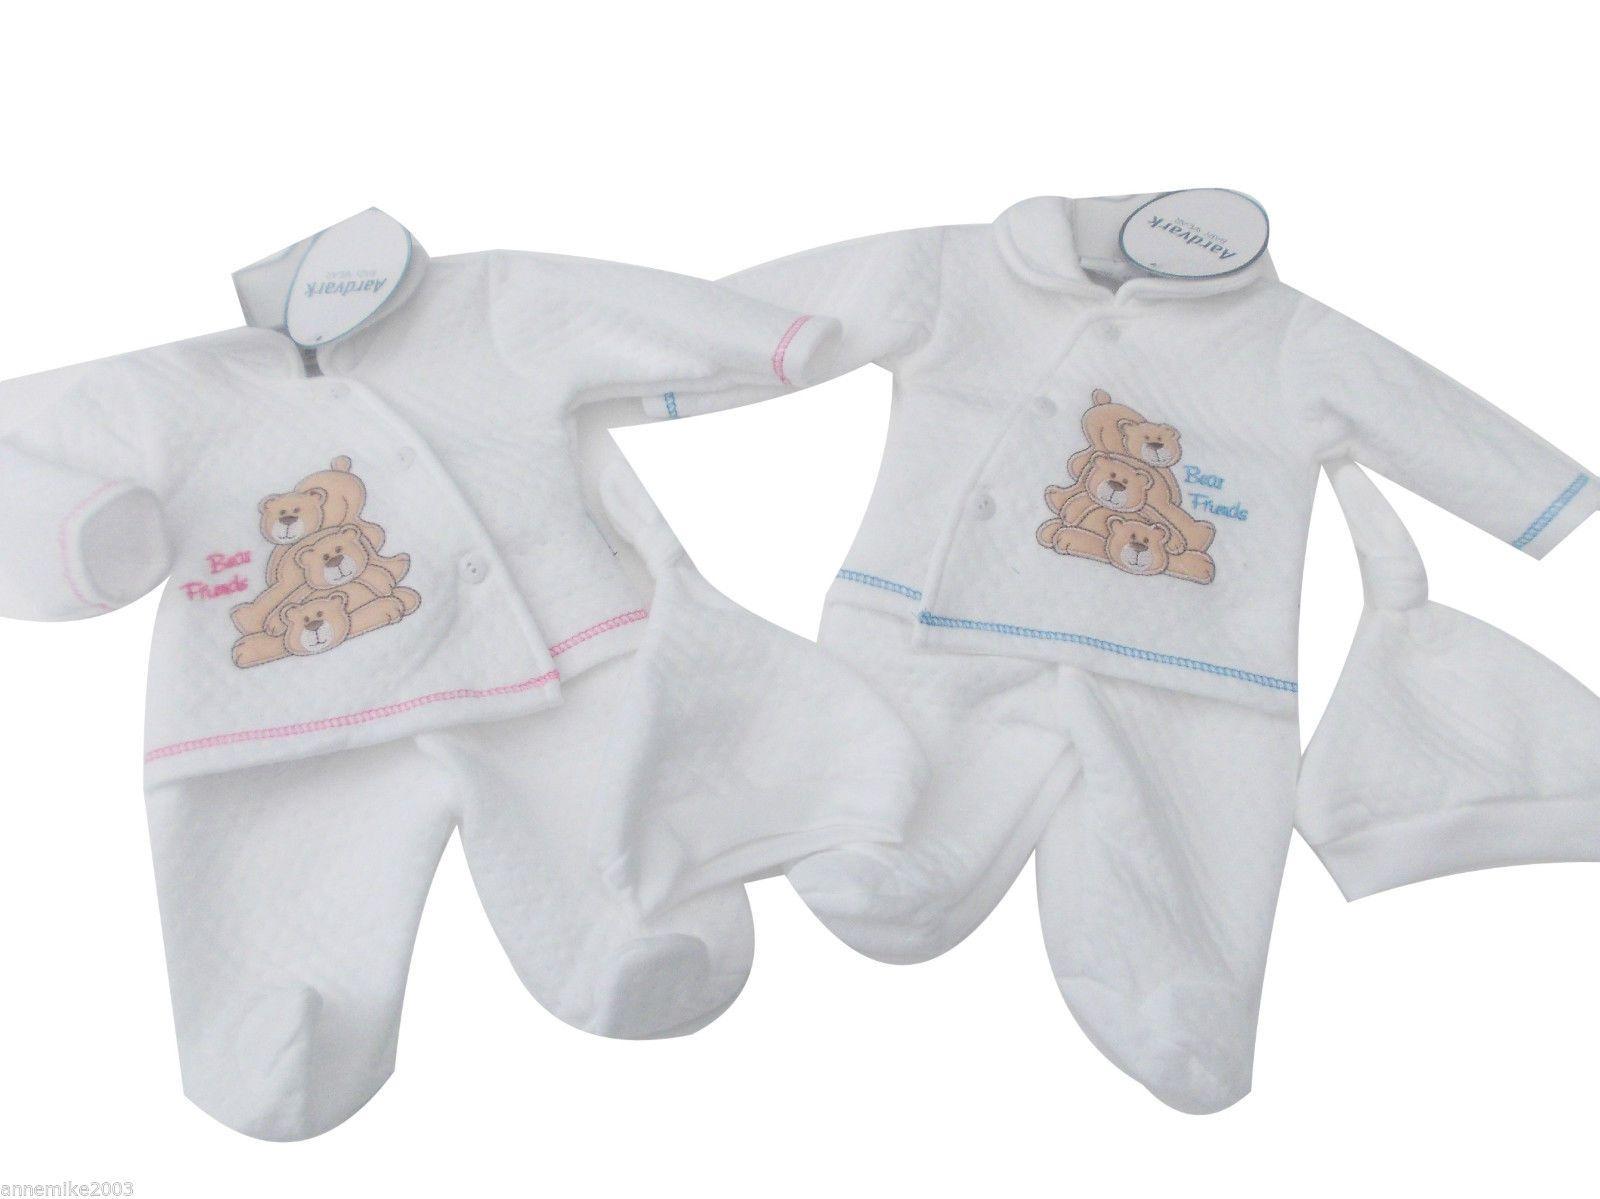 86582cf82fa BNWT Baby Prem Premature Preemie Baby Boys Girls Clothes 3 Piece suit   Hat